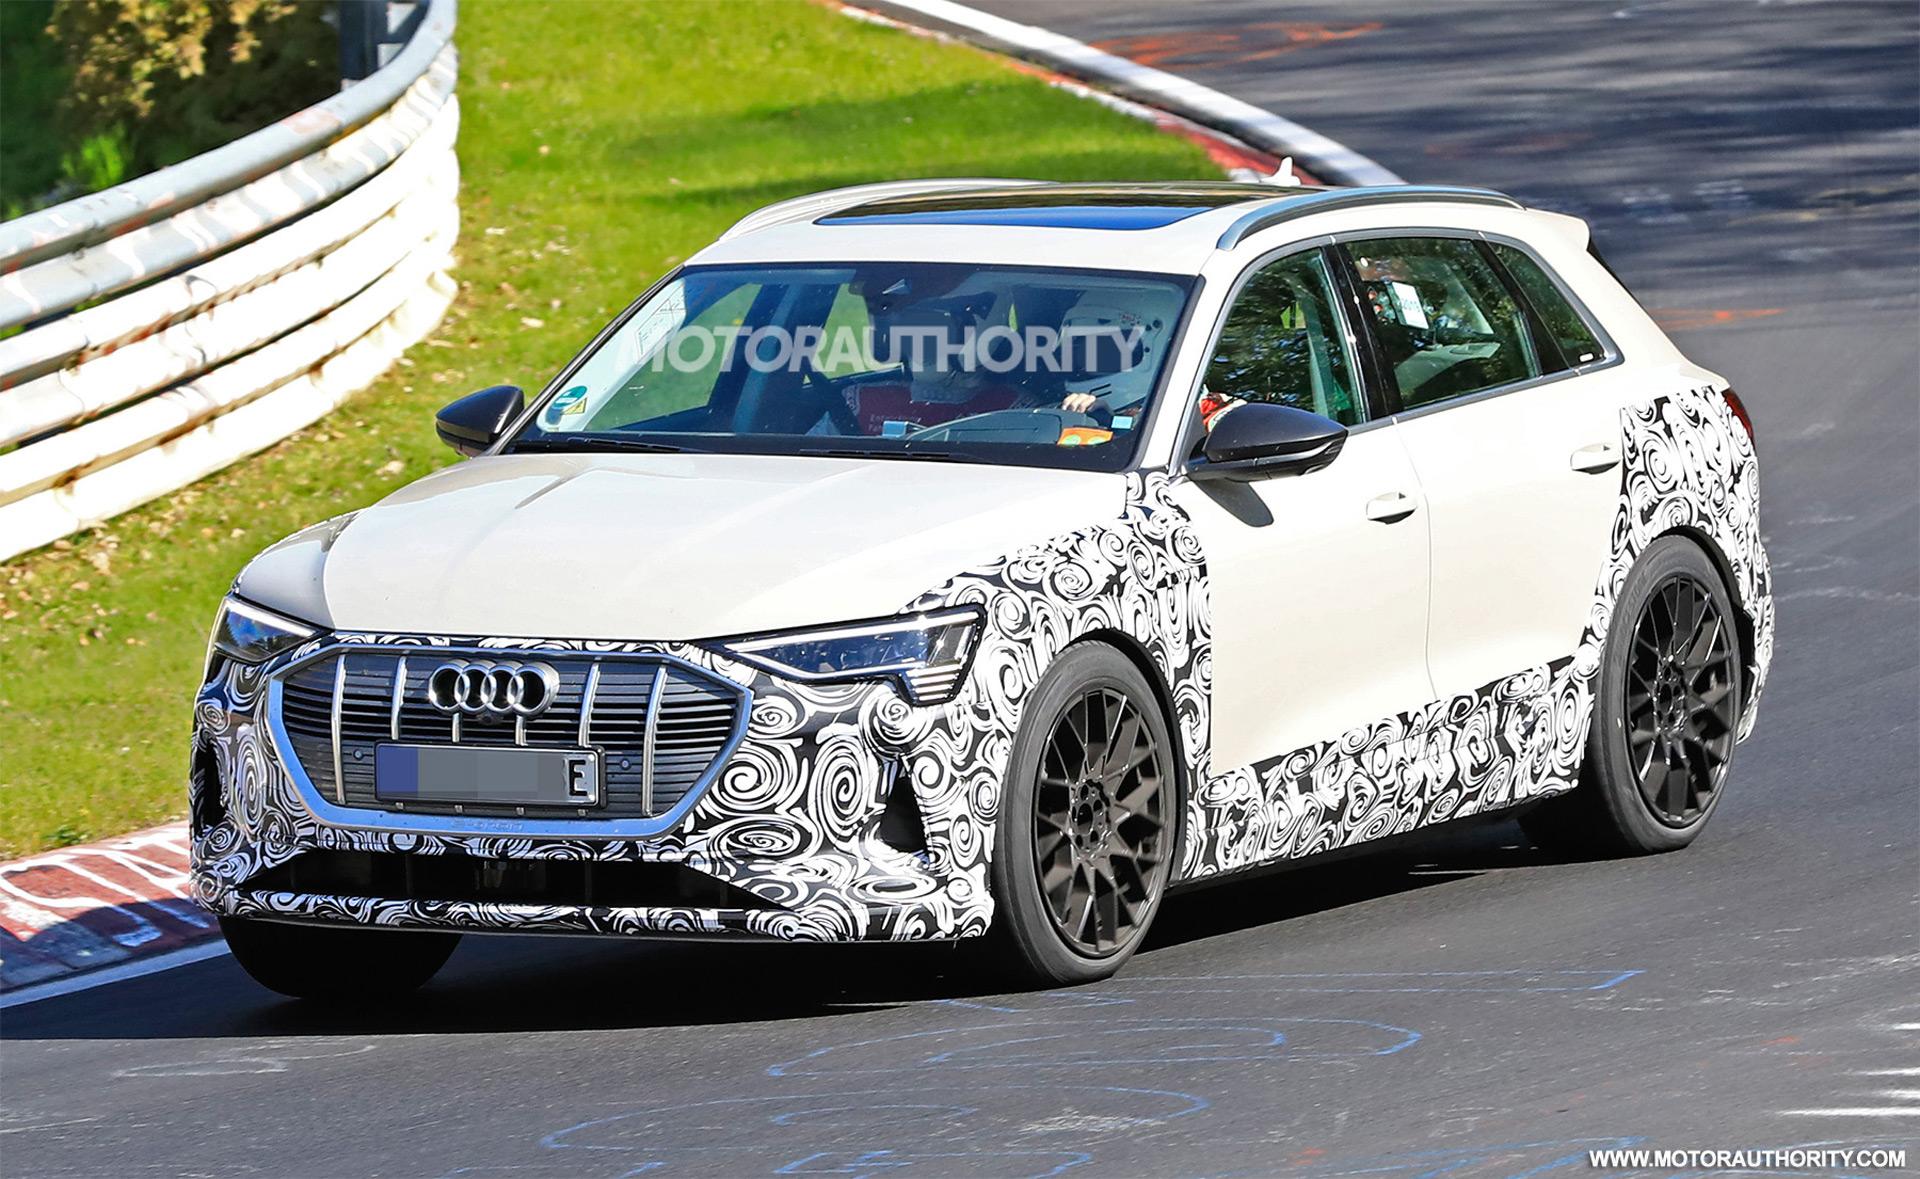 2018 [Audi] E-Tron Quattro - Page 7 2020-audi-e-tron-s-spy-shots--image-via-s-baldauf-sb-medien_100702341_h